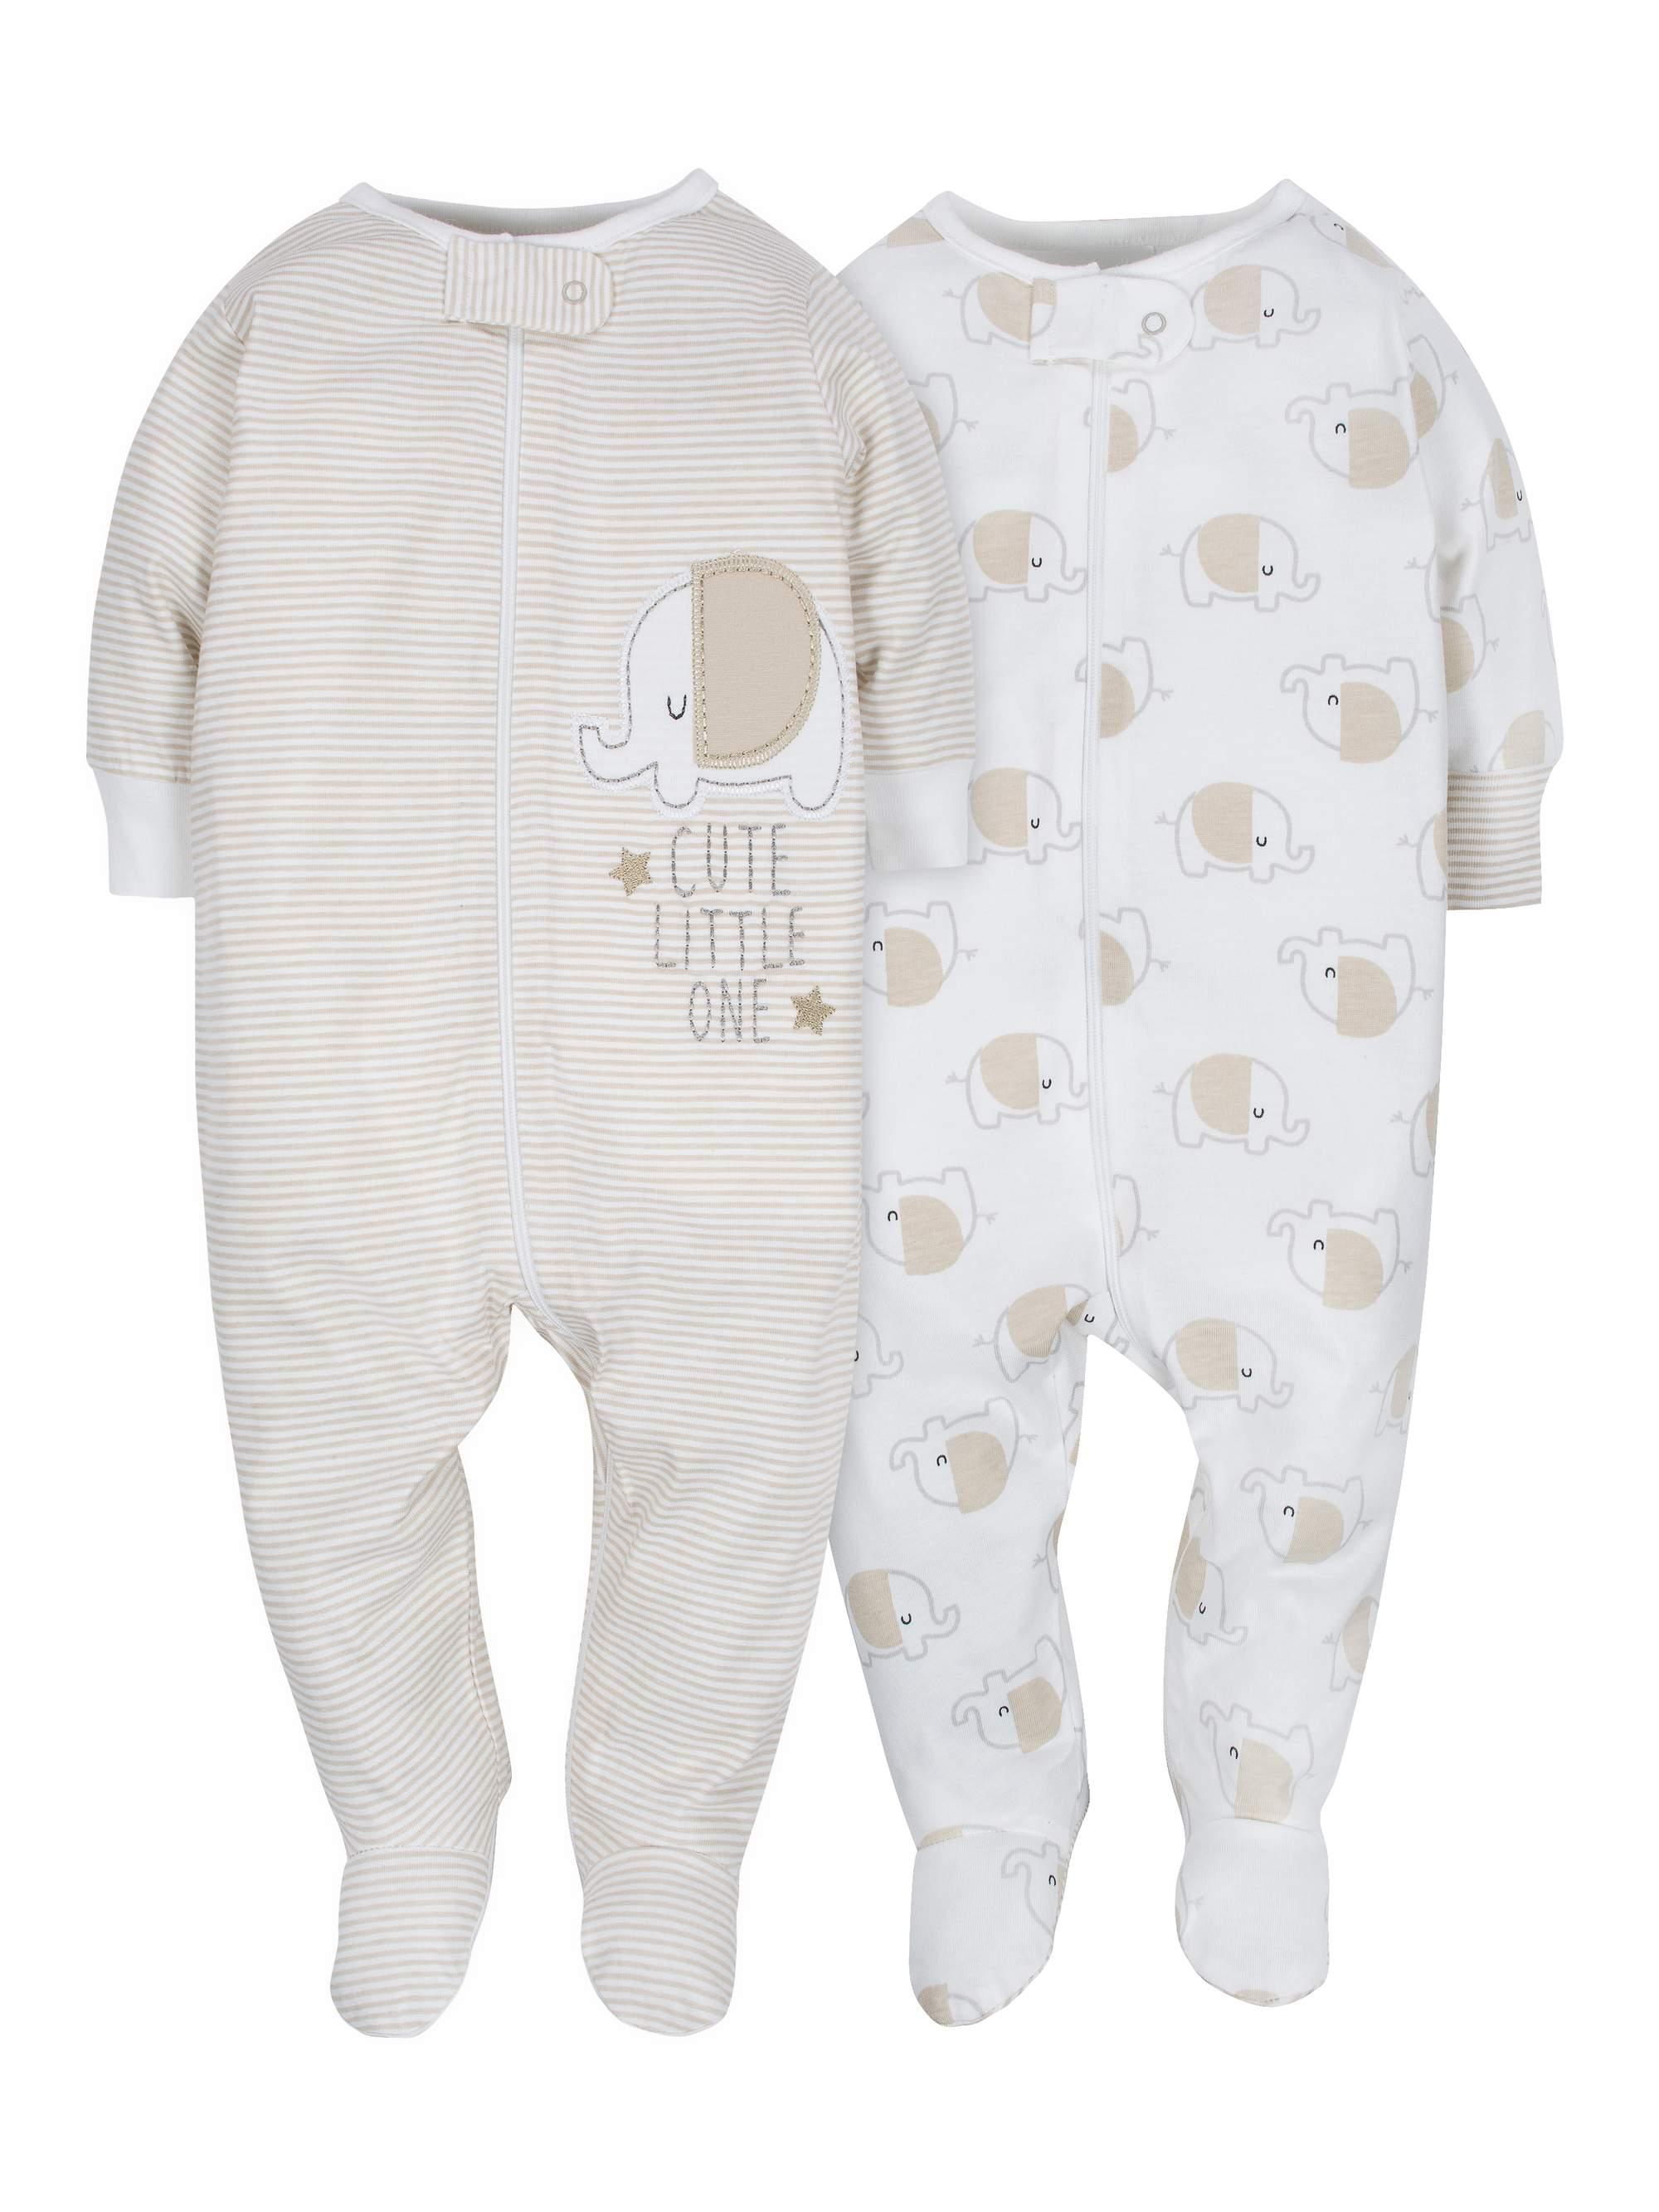 Zip Front Sleep N Play, 2pk (Baby Boy or Baby Girl Unisex)